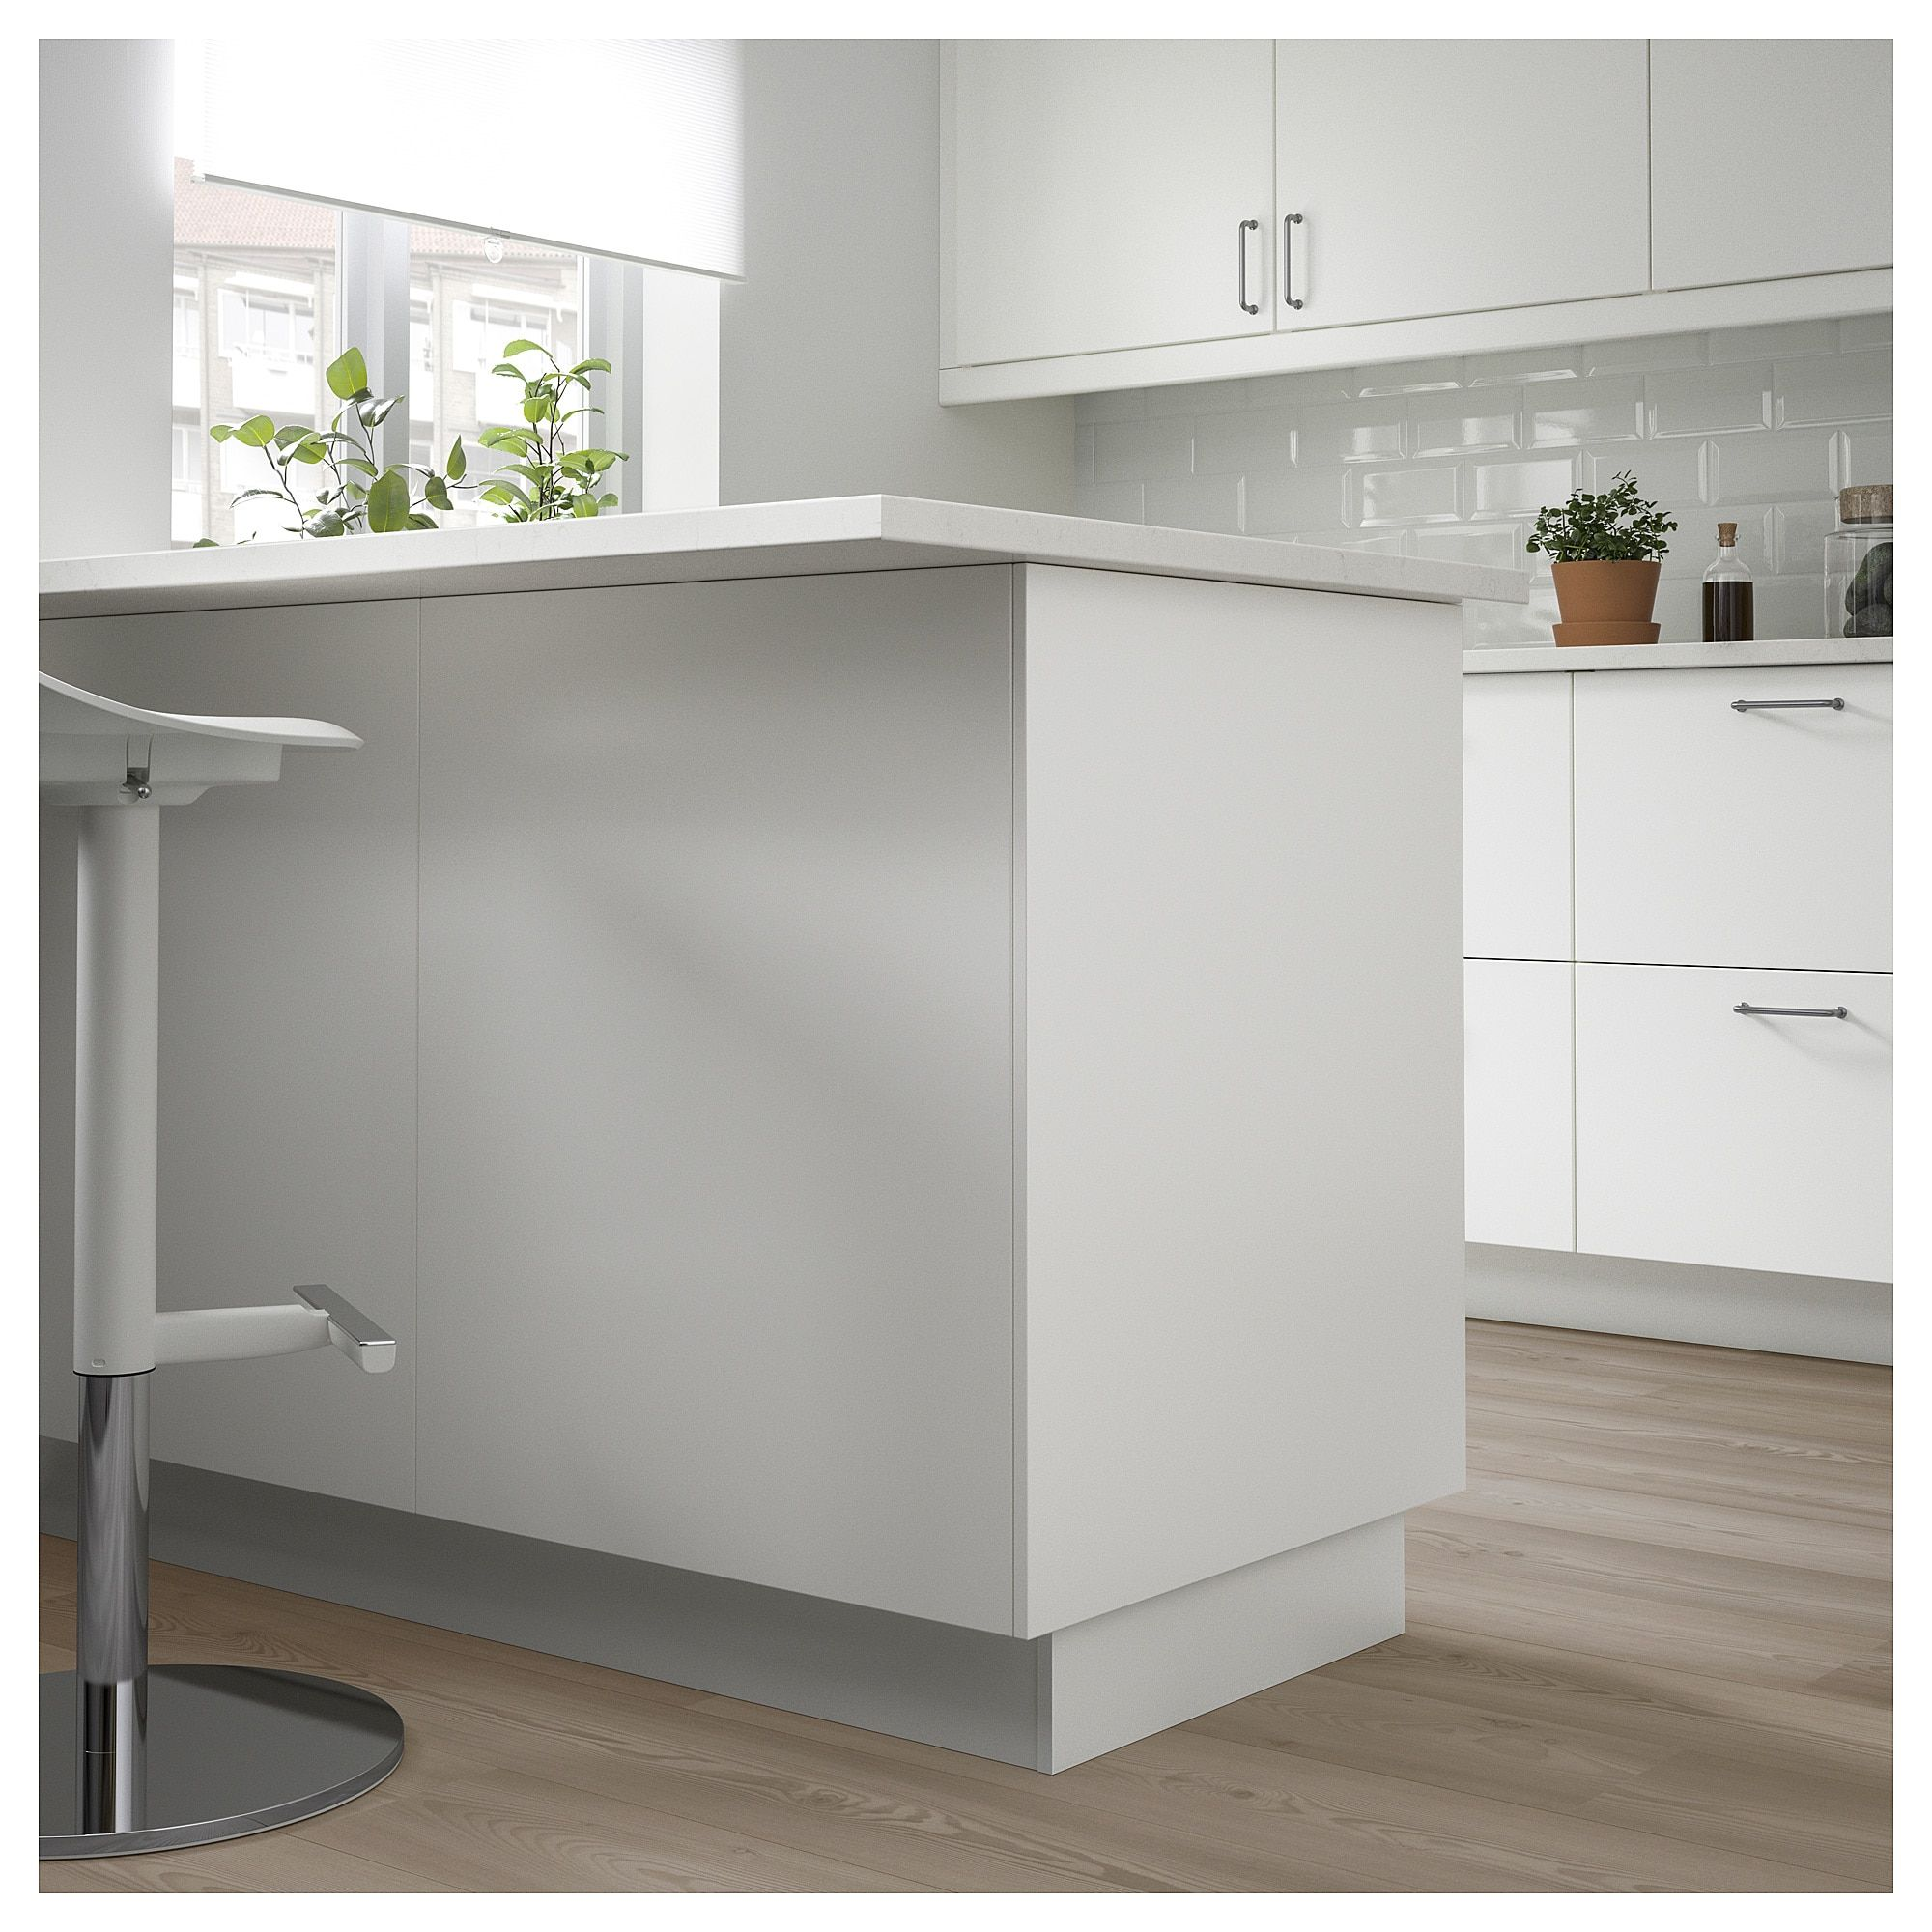 Forbattra Cover Panel White 25x90 63x229 Cm White Paneling High Gloss Kitchen Minimal Kitchen Design